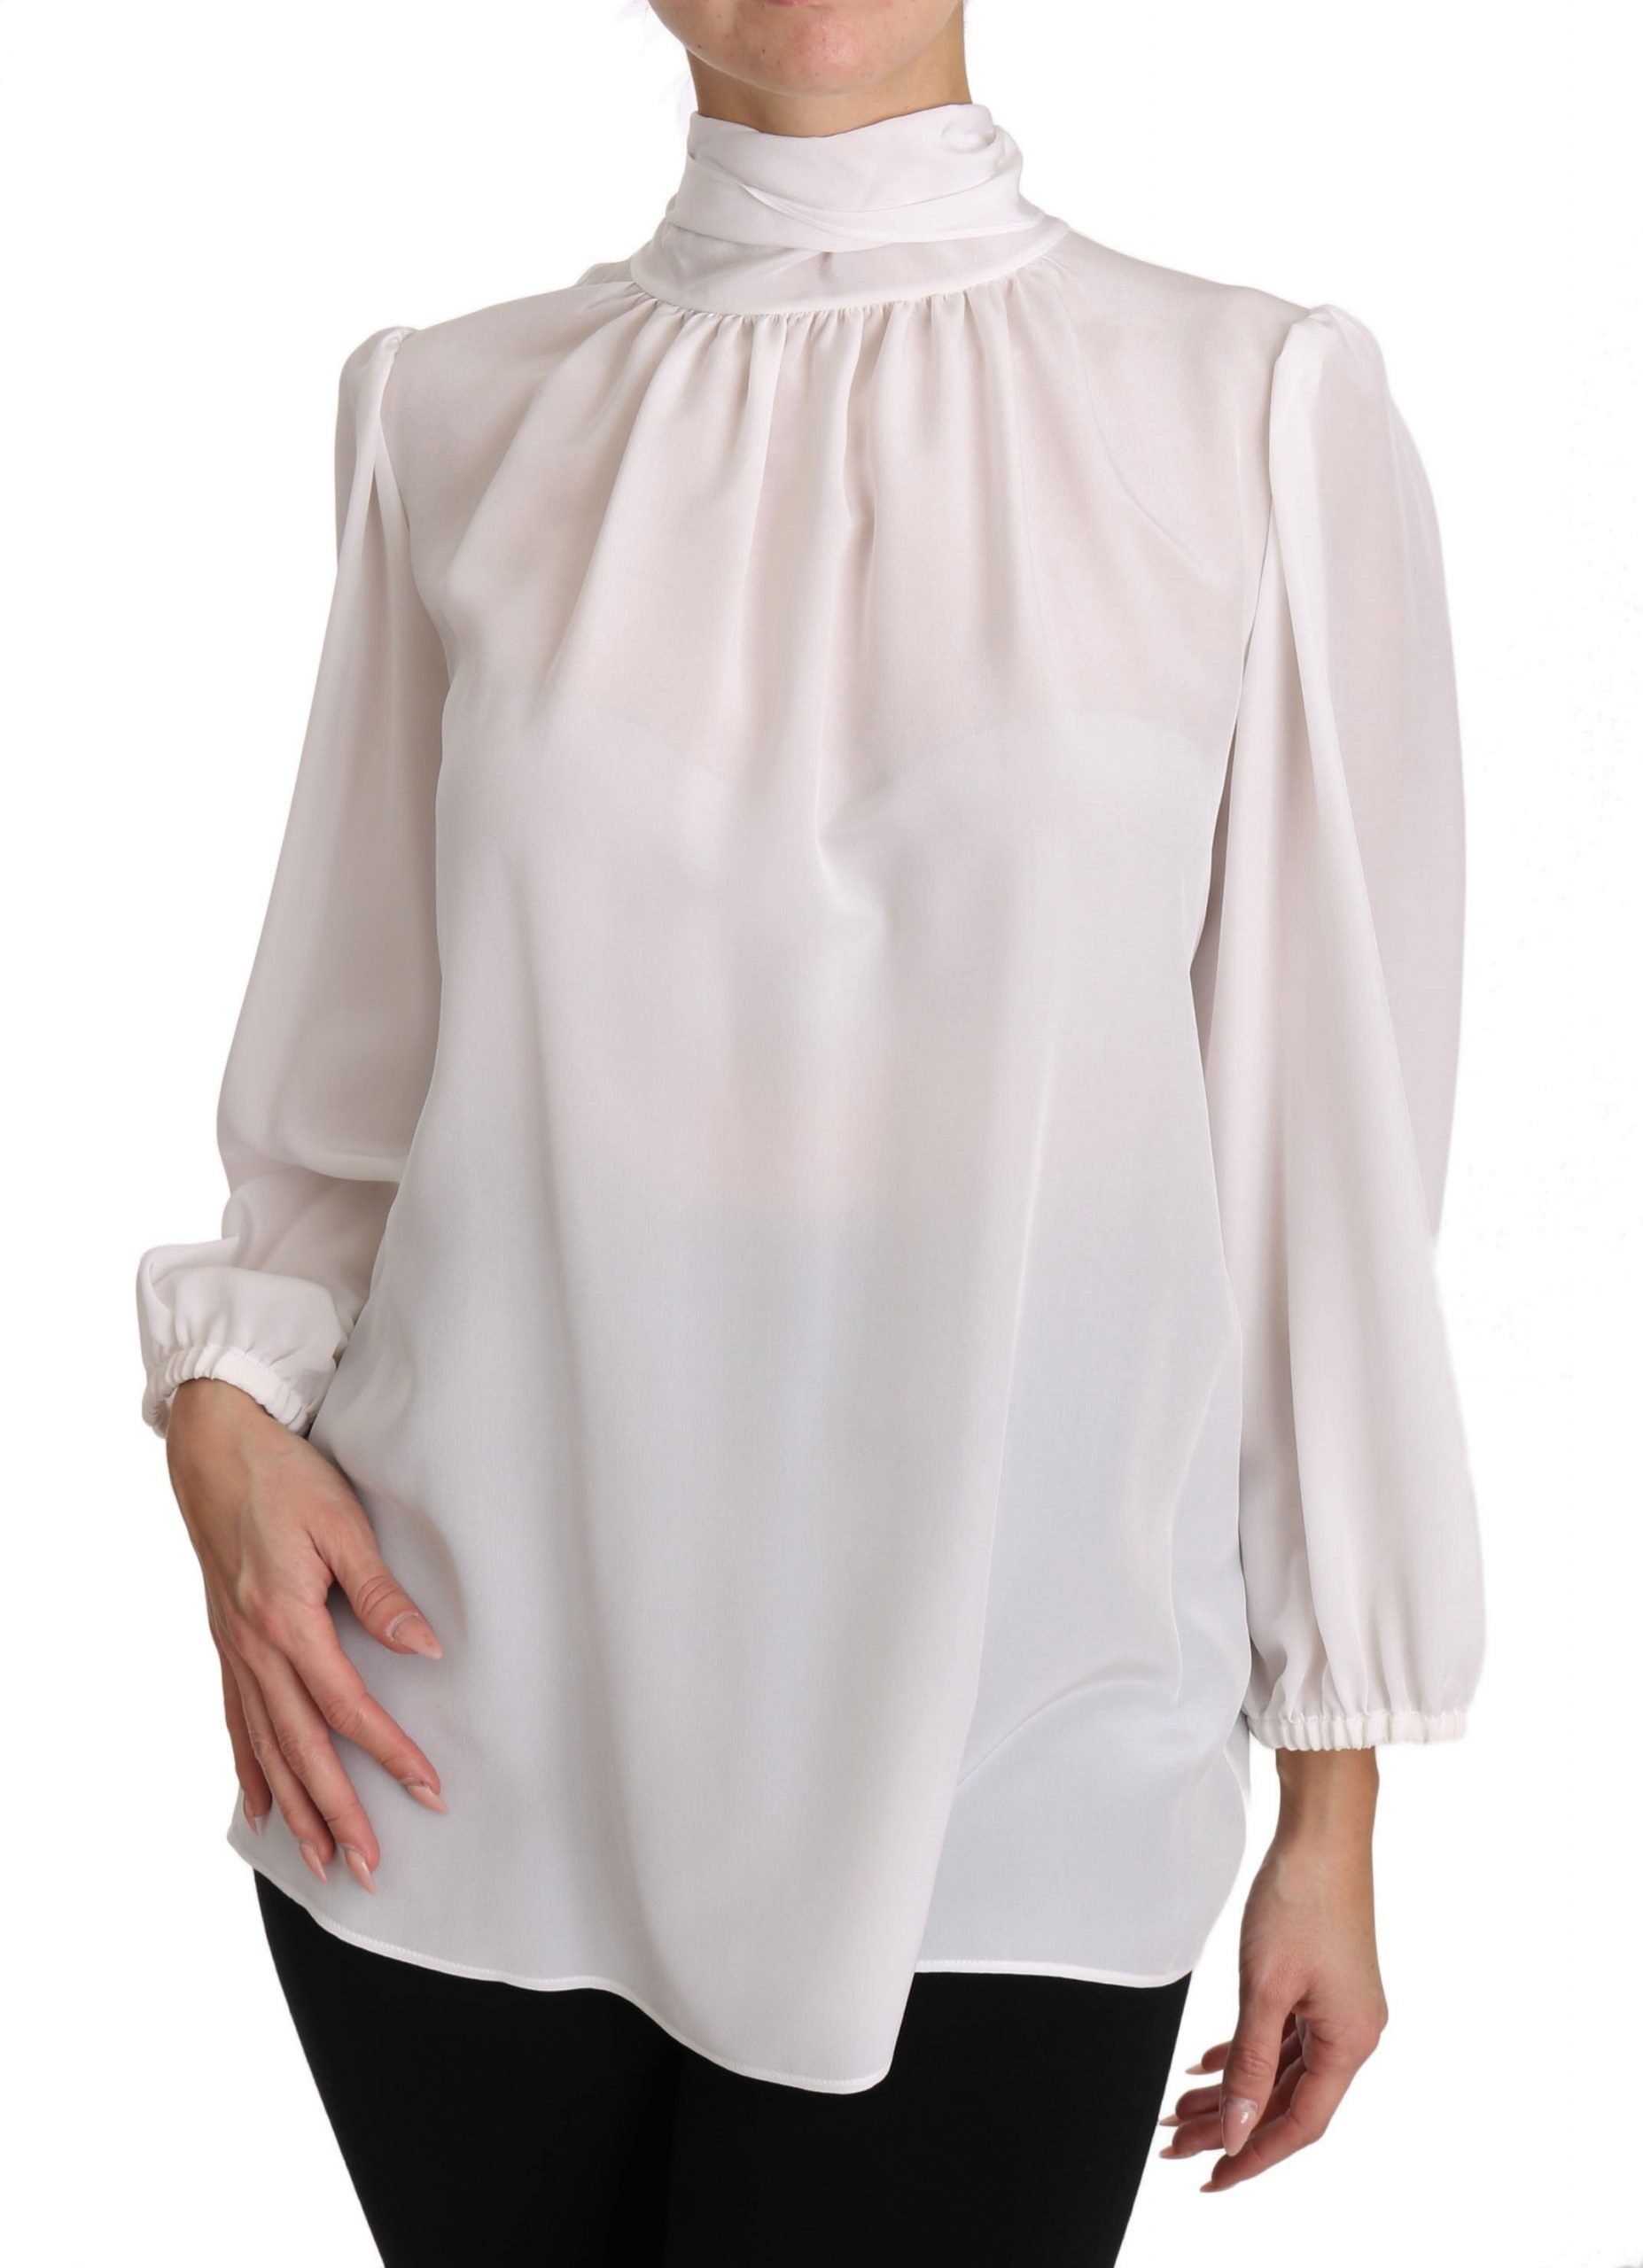 Dolce & Gabbana Women's Silk LS Tops White TSH3137 - IT40|S